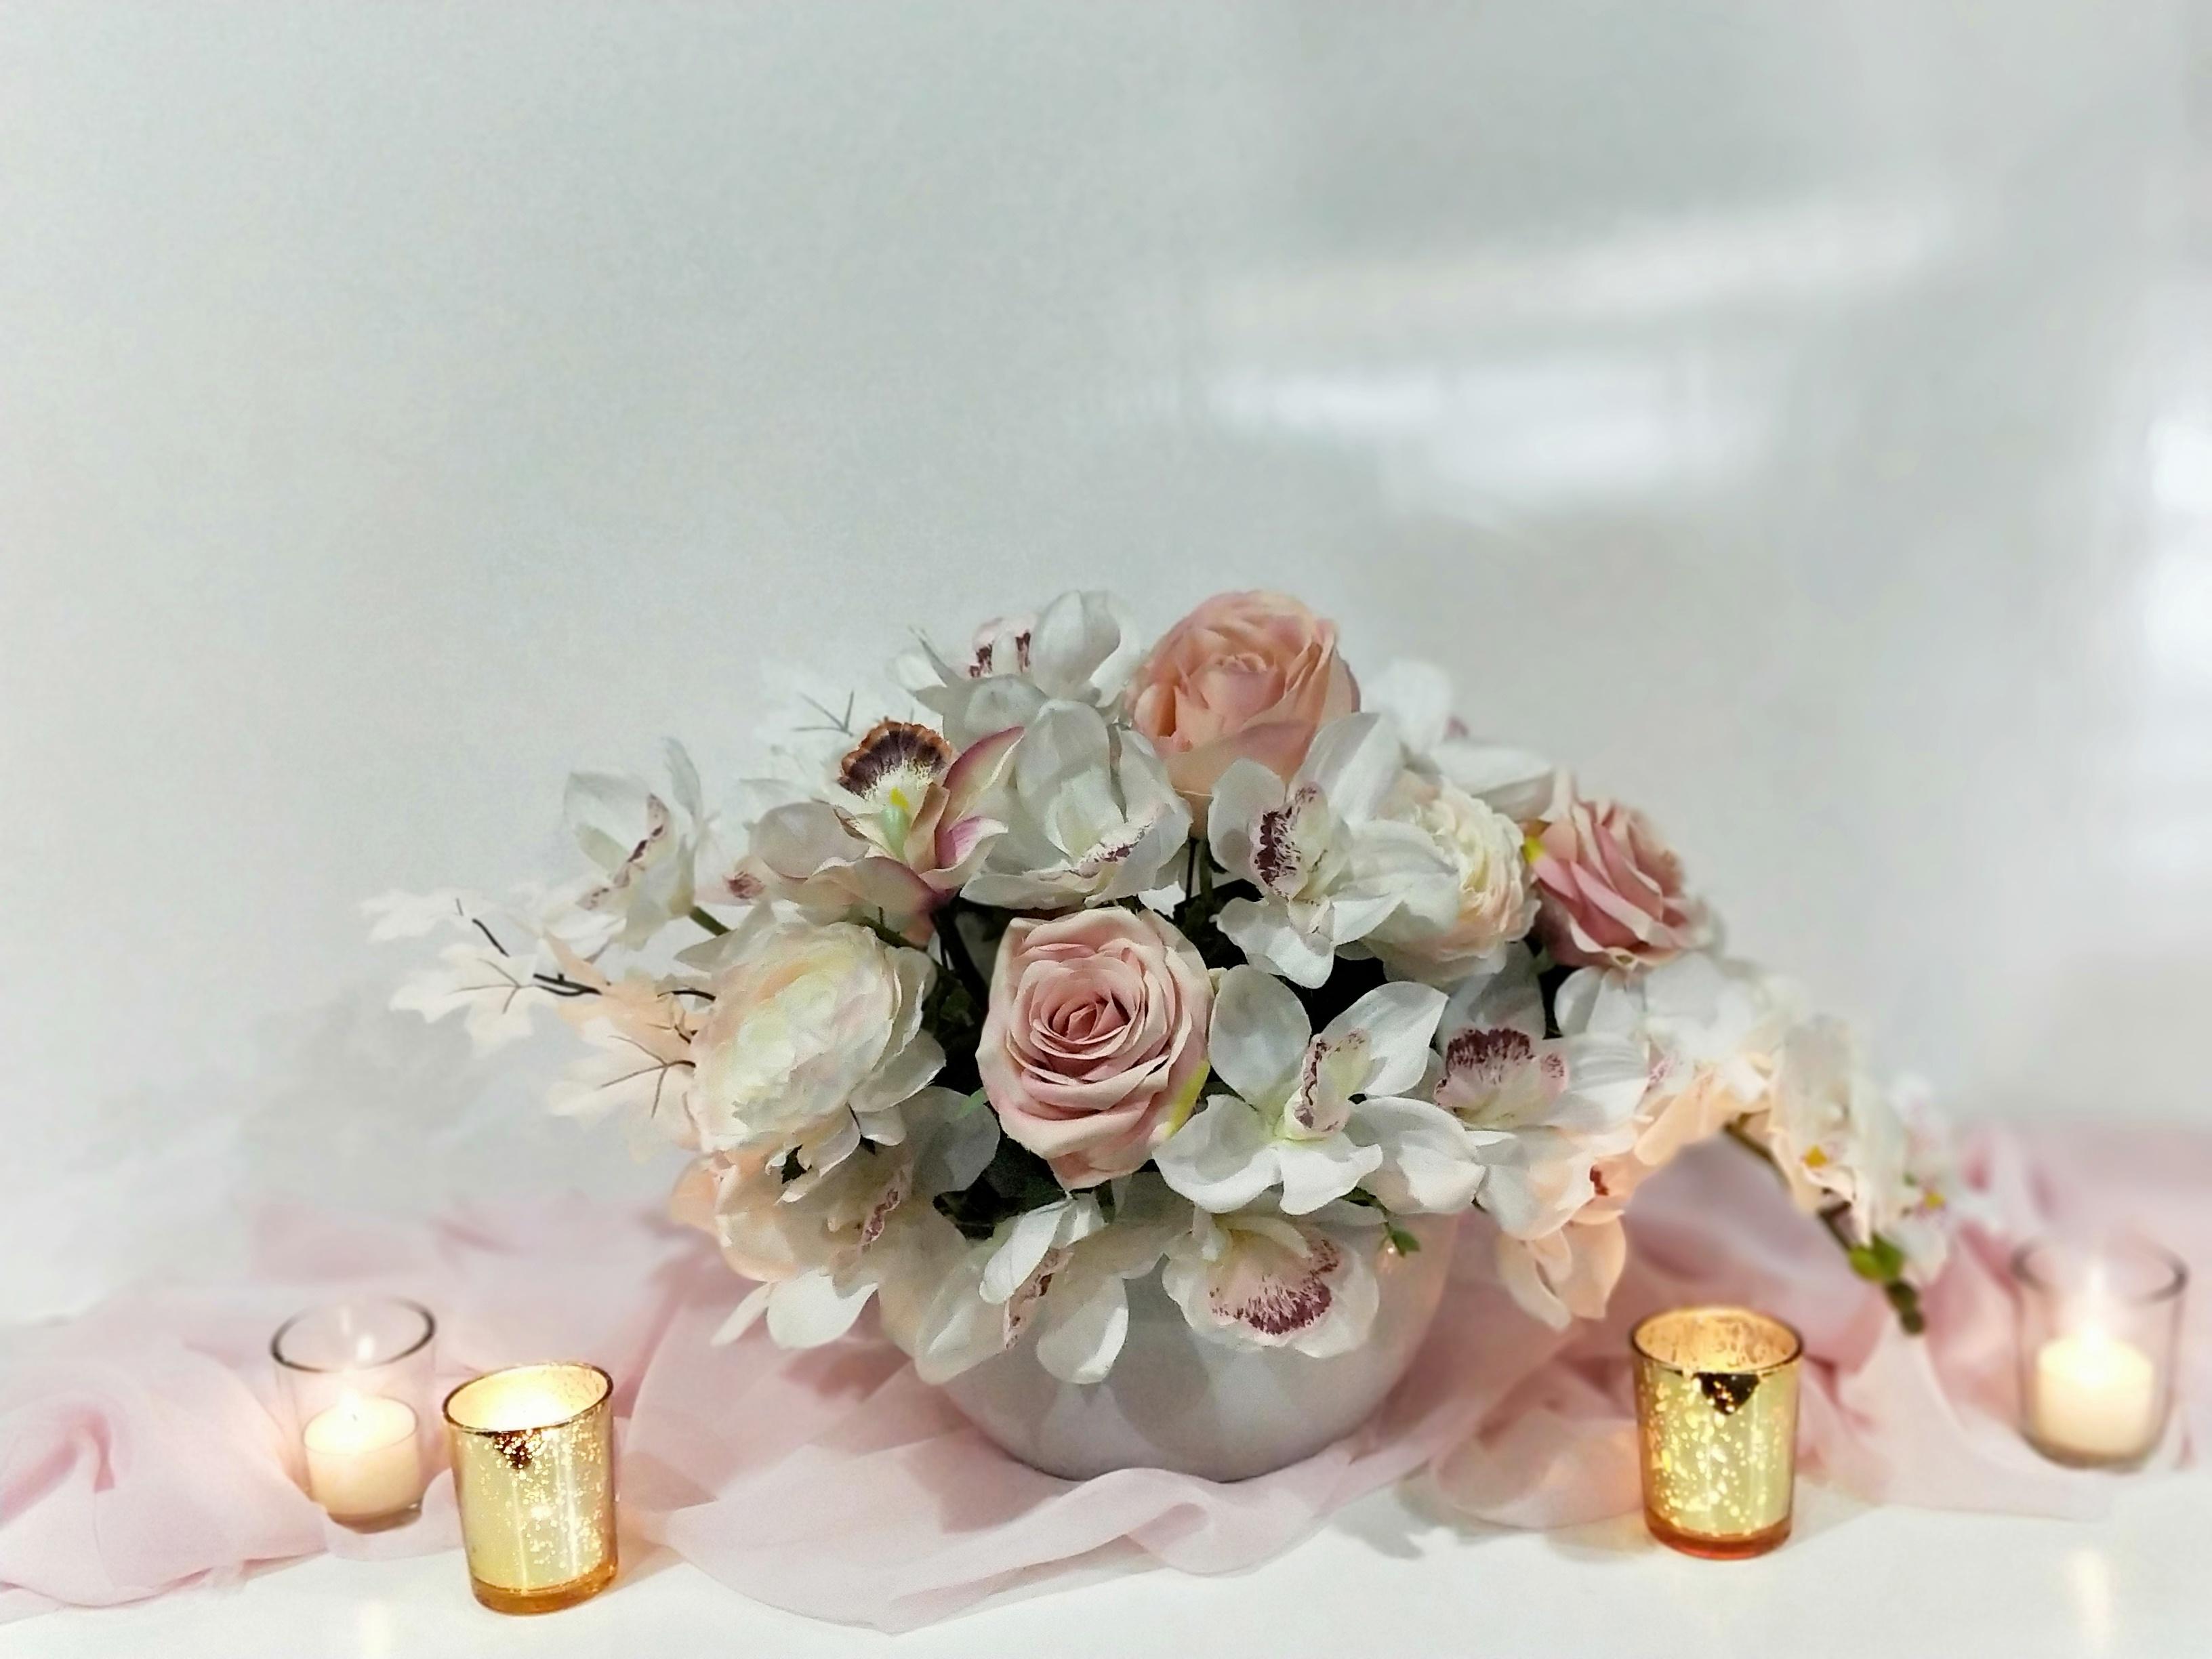 Cymbidium Orchids and Roses Centrepiece.